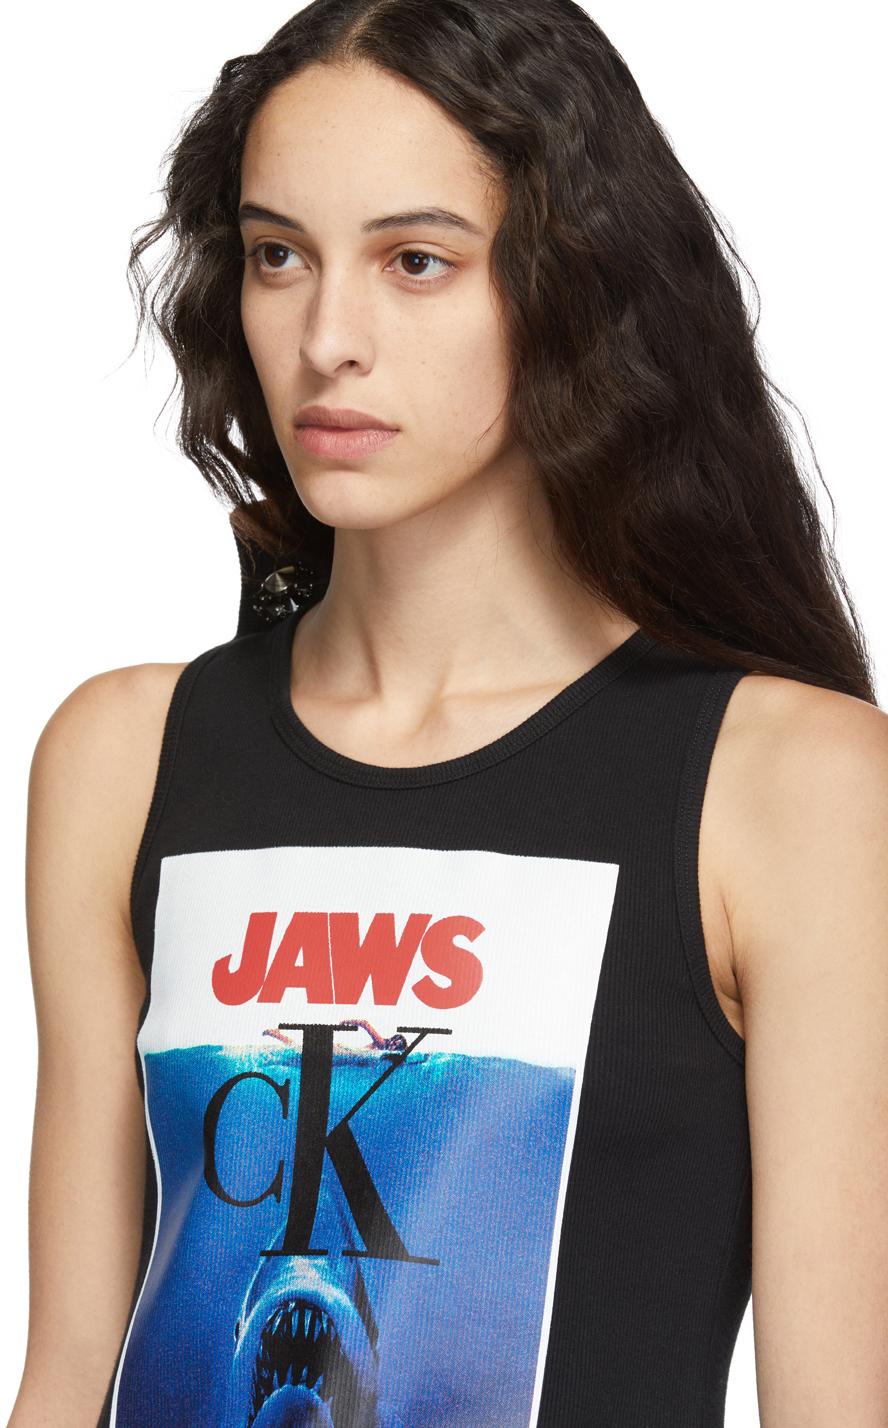 Calvin Klein 205w39nyc Tops Black 'Jaws' Tank Top